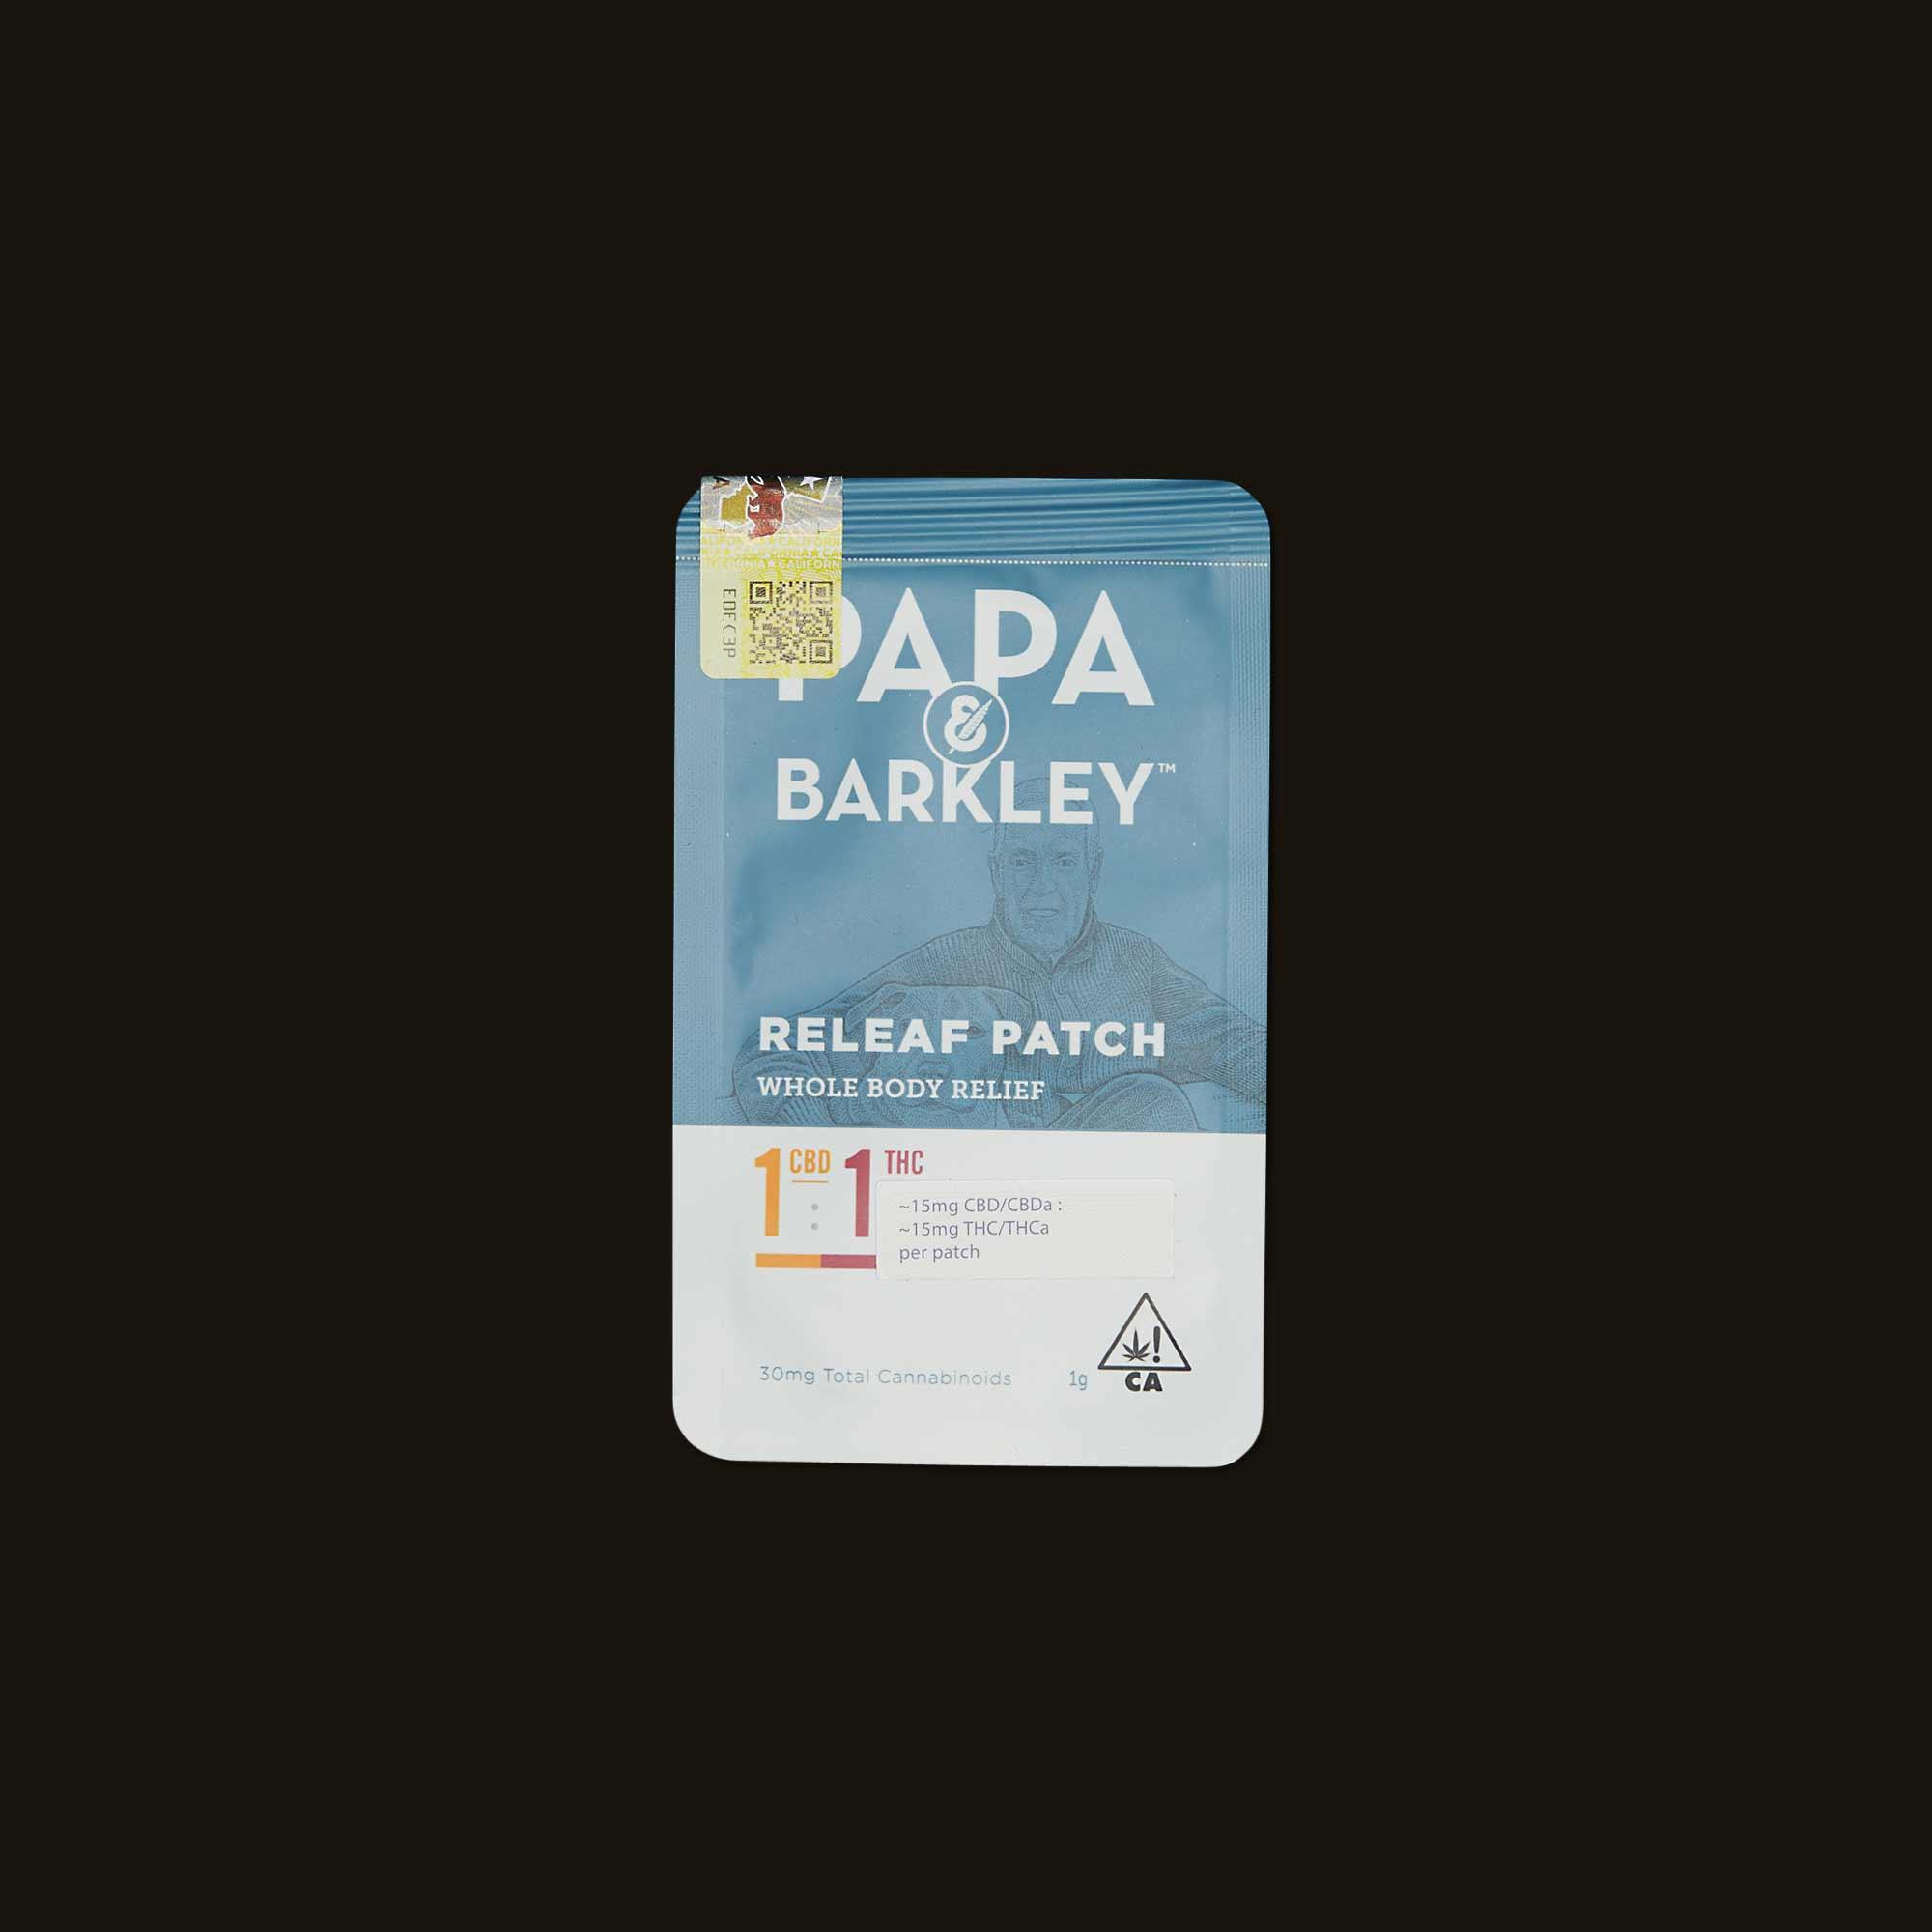 Papa & Barkley 1:1 CBD:THC Releaf Patch